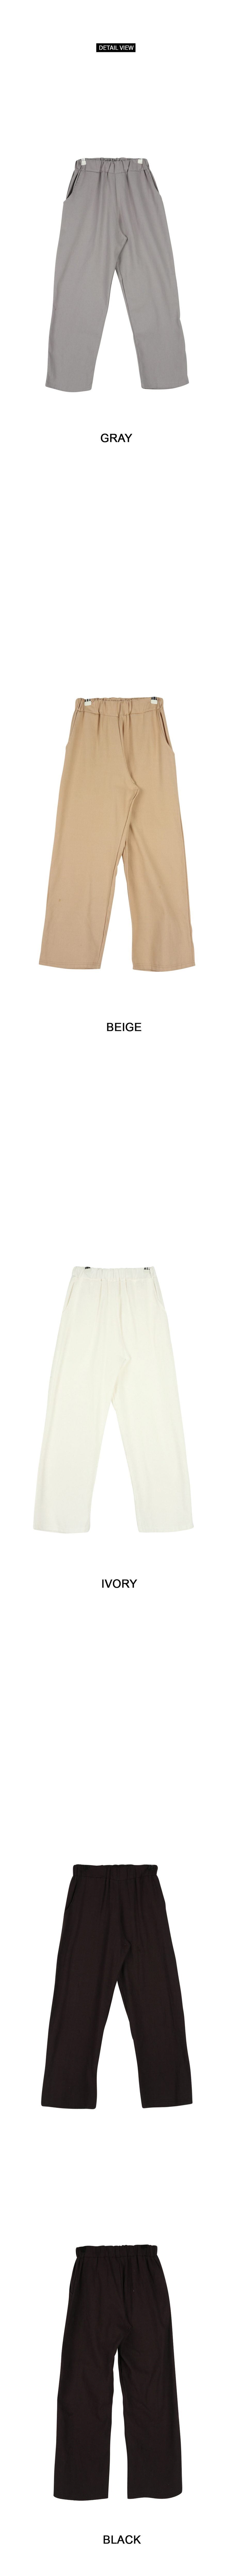 Indy Cotton Bending Pants